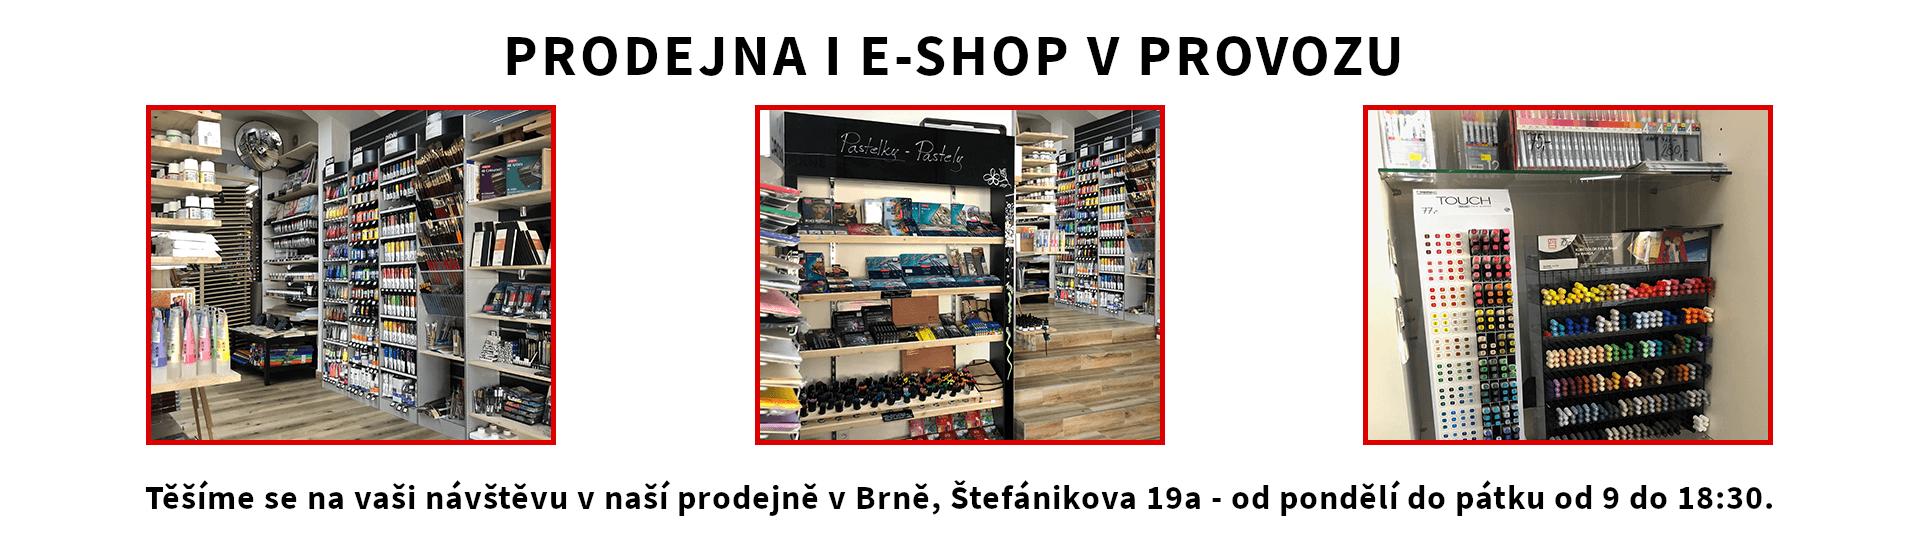 E-shop i prodejna v provozu